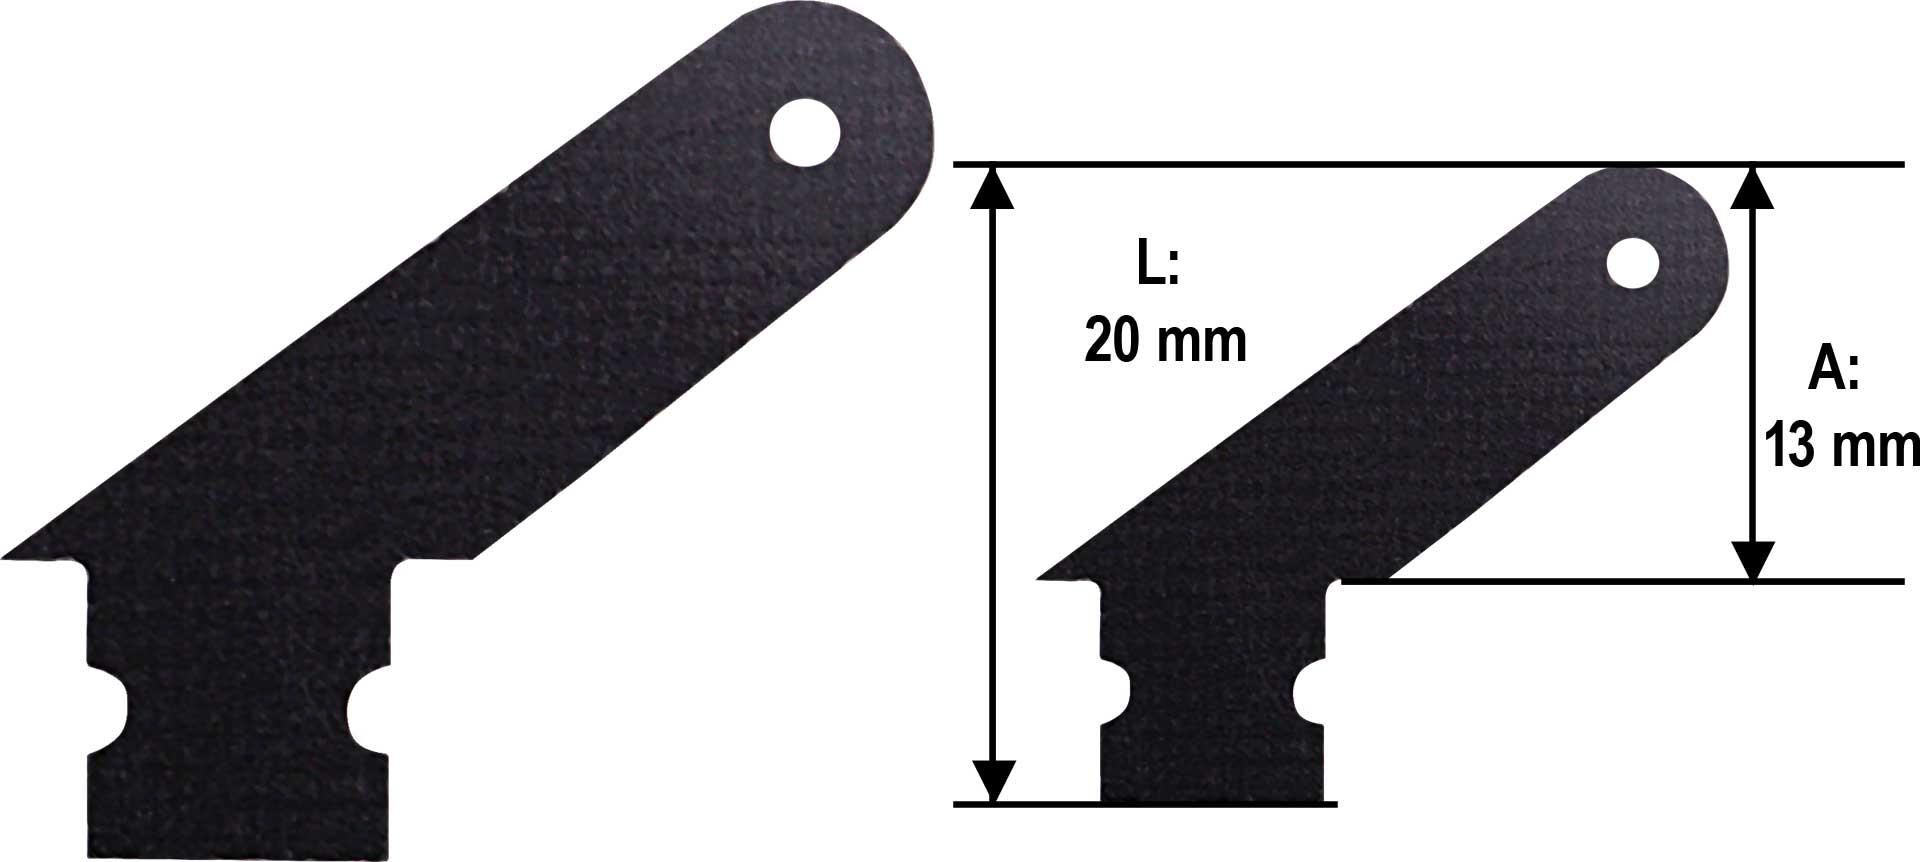 MODELLBAU LINDINGER GFK Ruderhorn 10mm Set 10Stk. 1,0mm GFK schwarz